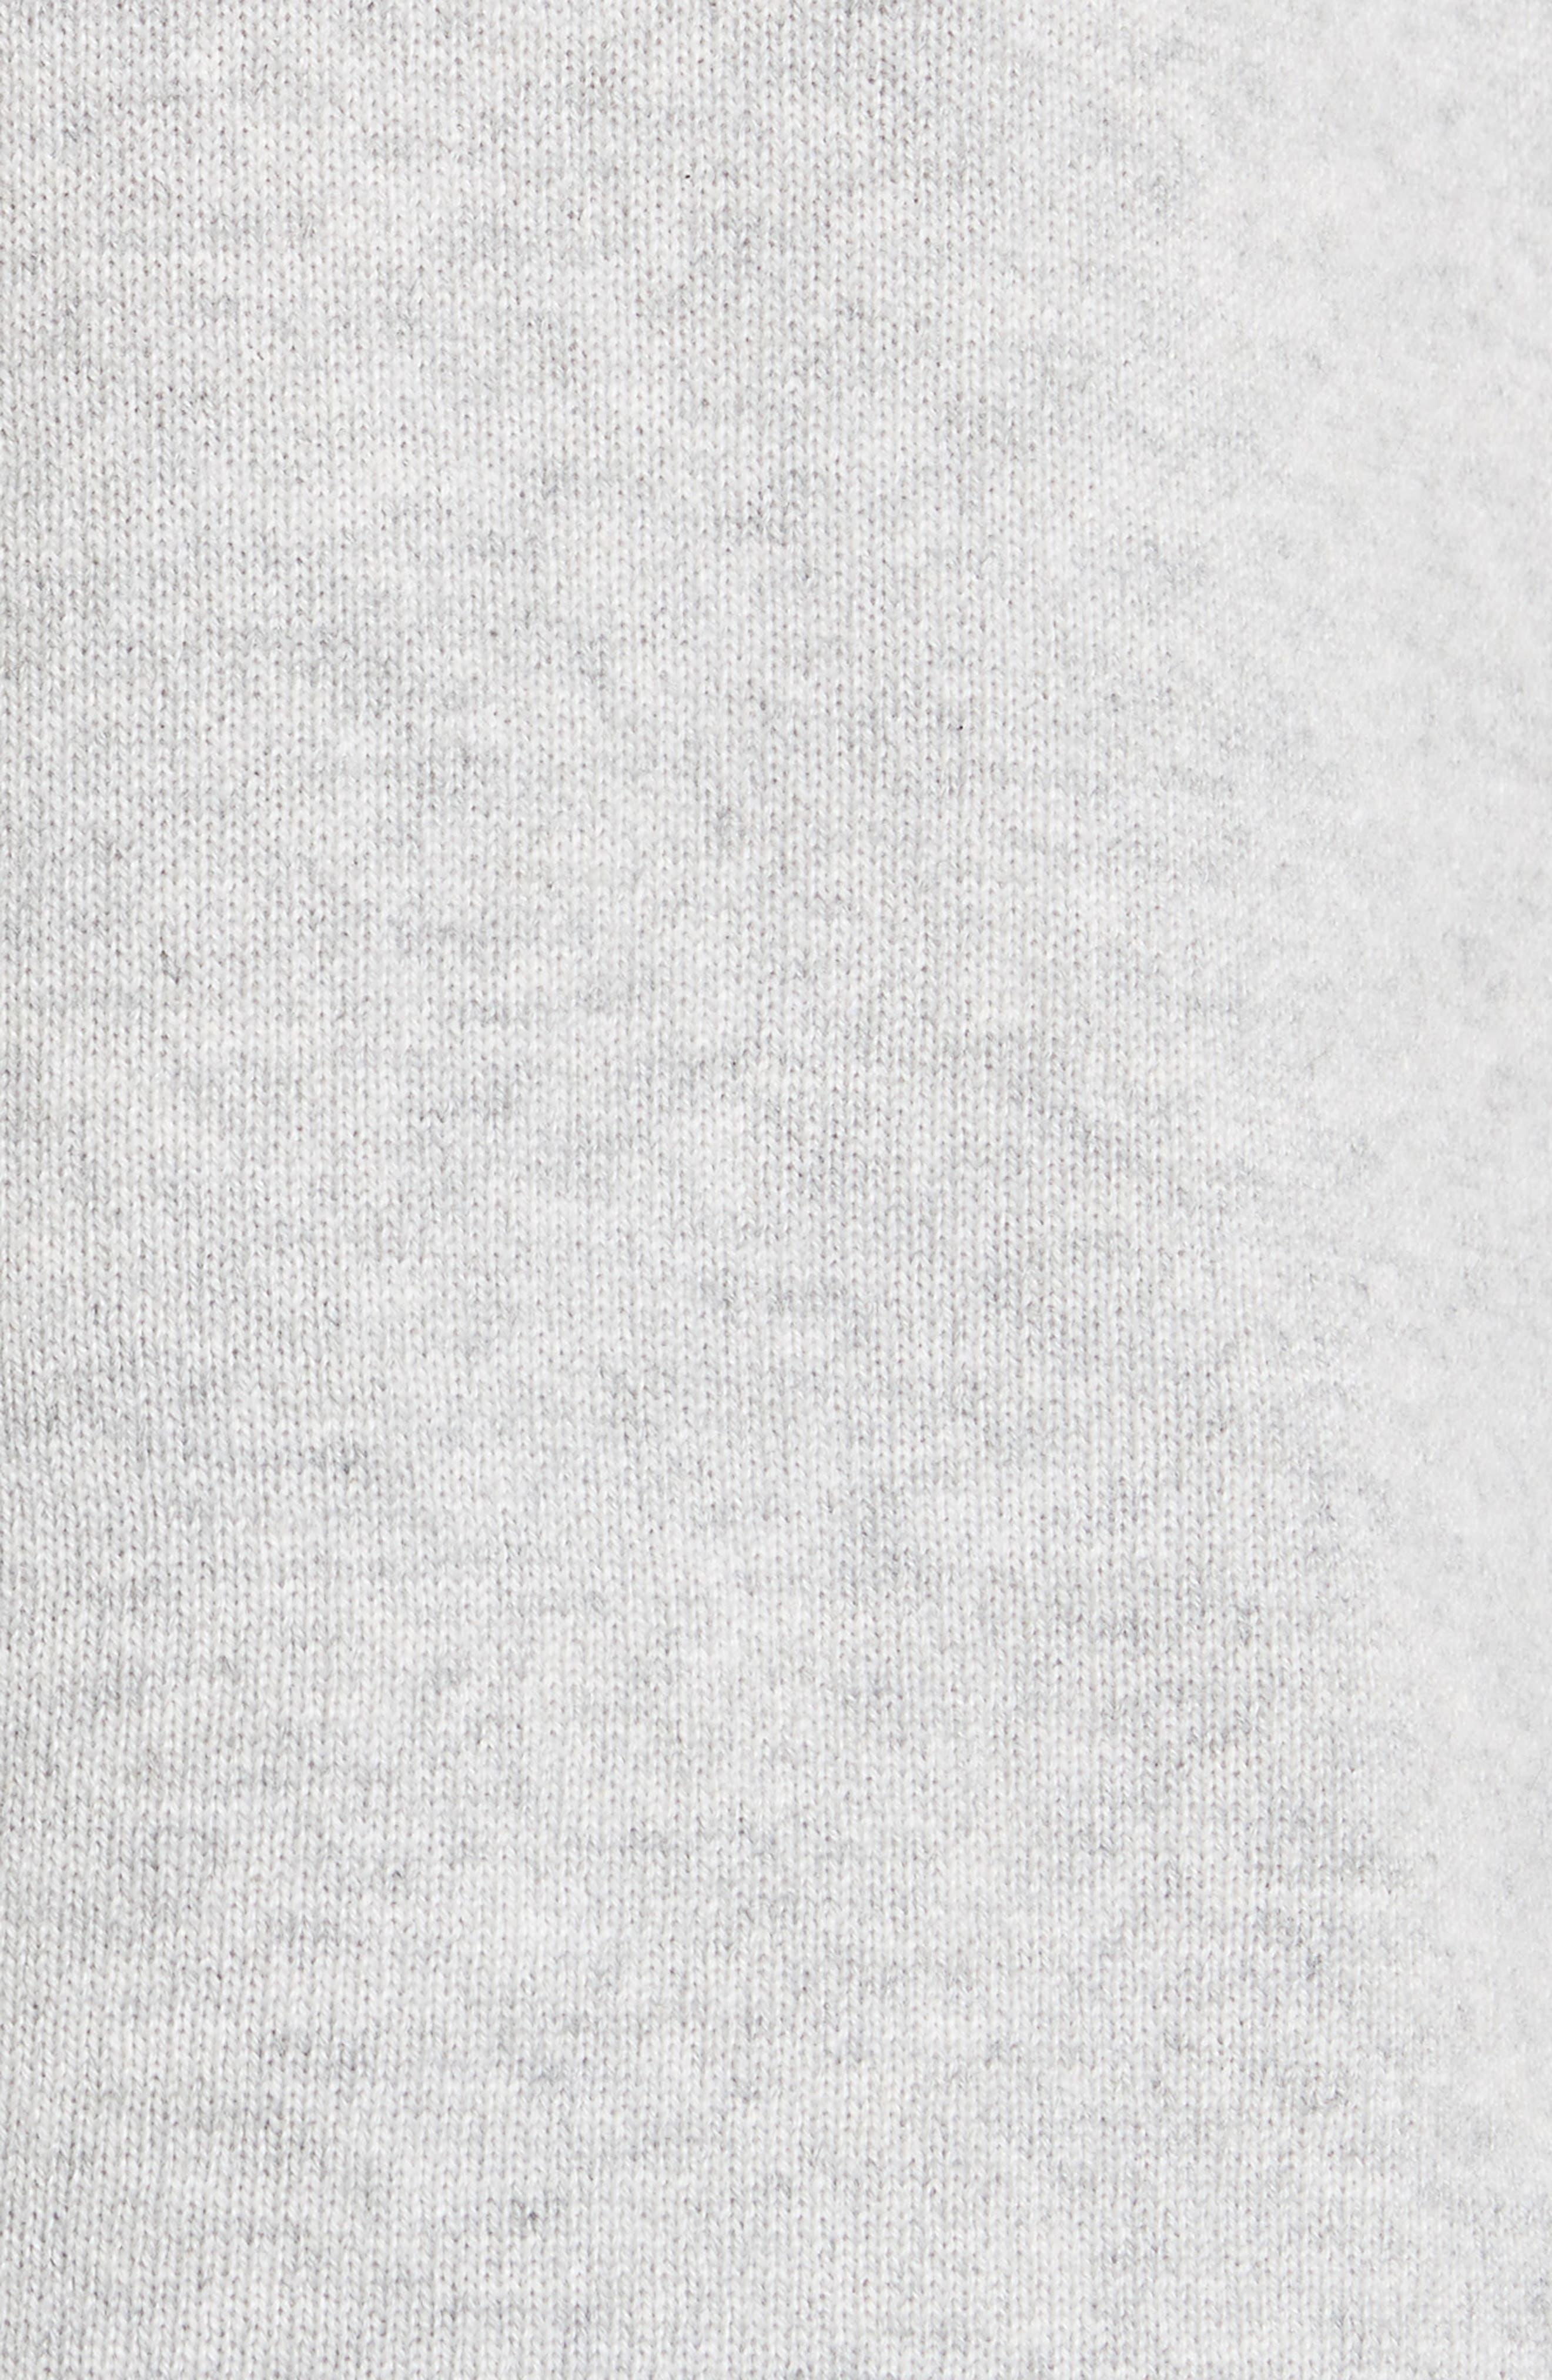 Micro Sequin Stripe Reverse Jersey Cashmere Blend Sweater,                             Alternate thumbnail 5, color,                             Light Grey Melange